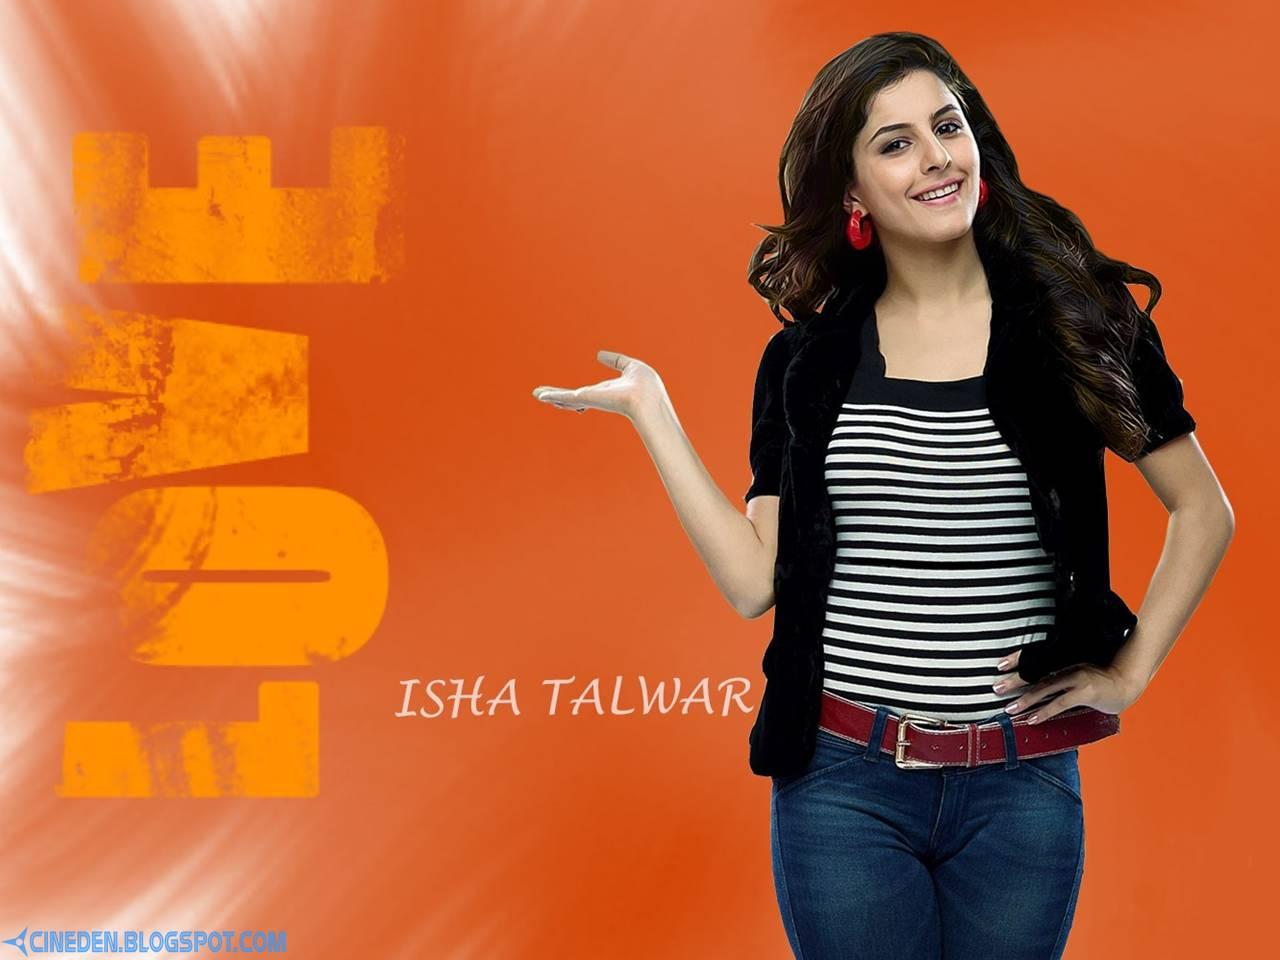 Bollywood is not my final destination: Isha Talwar